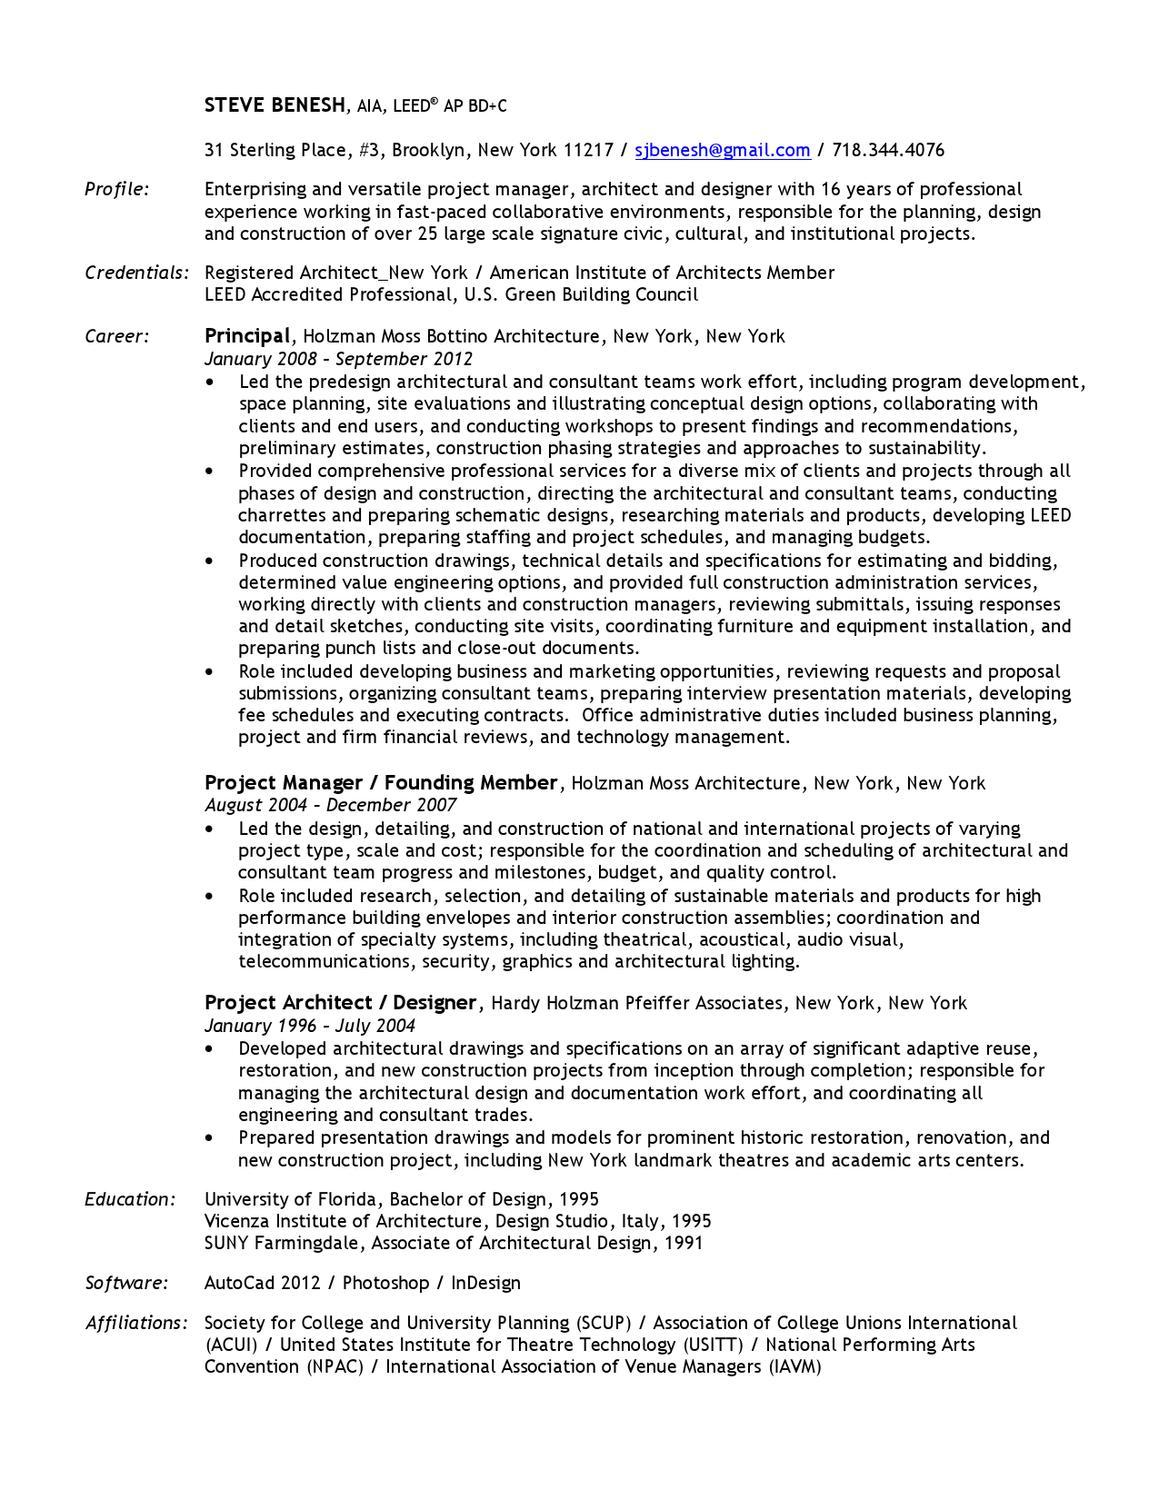 sb resume by steve benesh